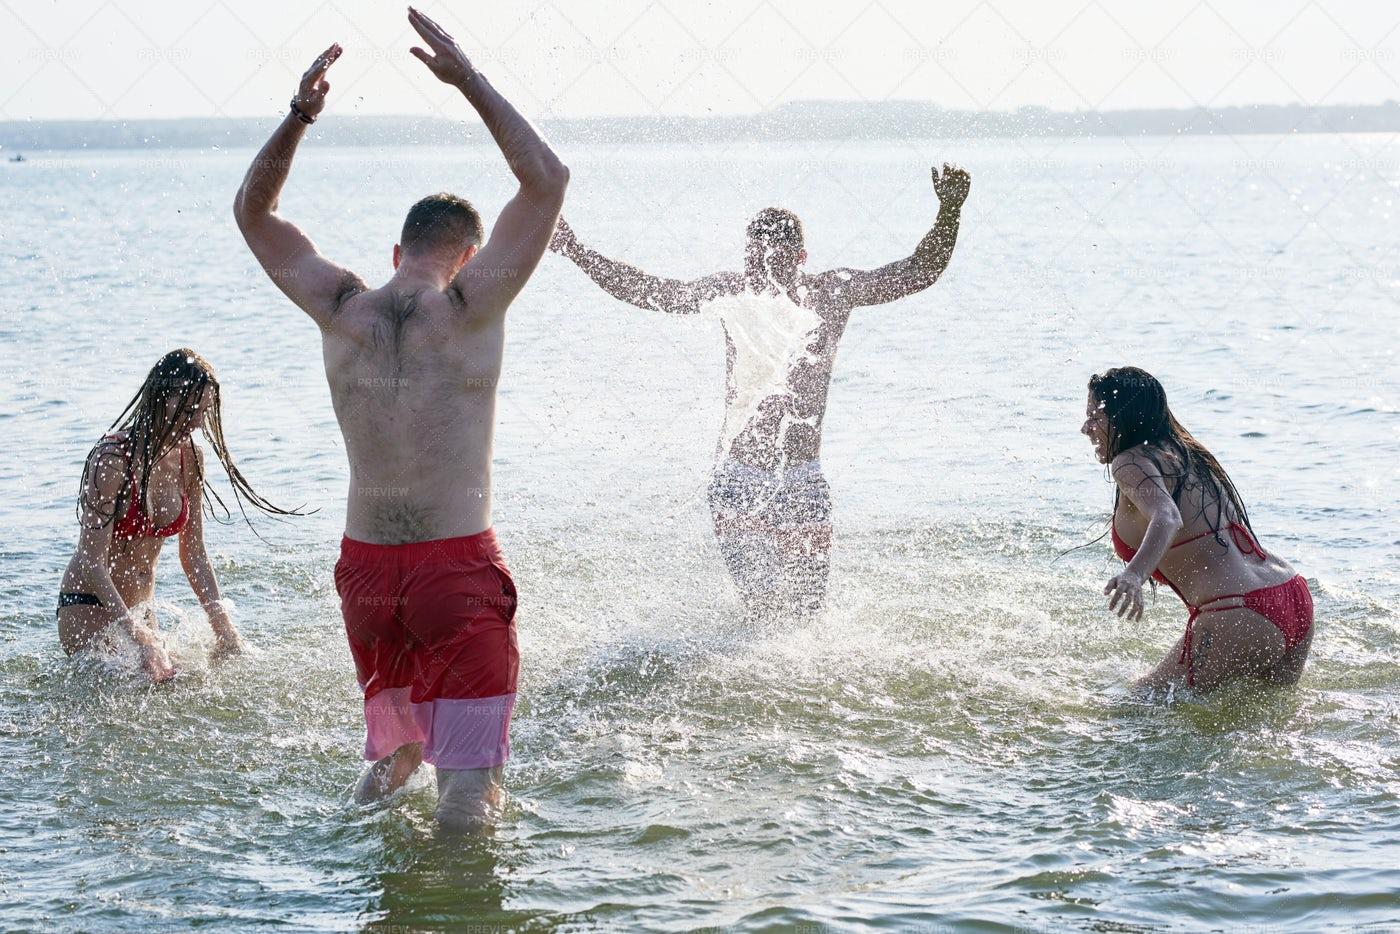 Carefree Friends Having Fun In Sea: Stock Photos